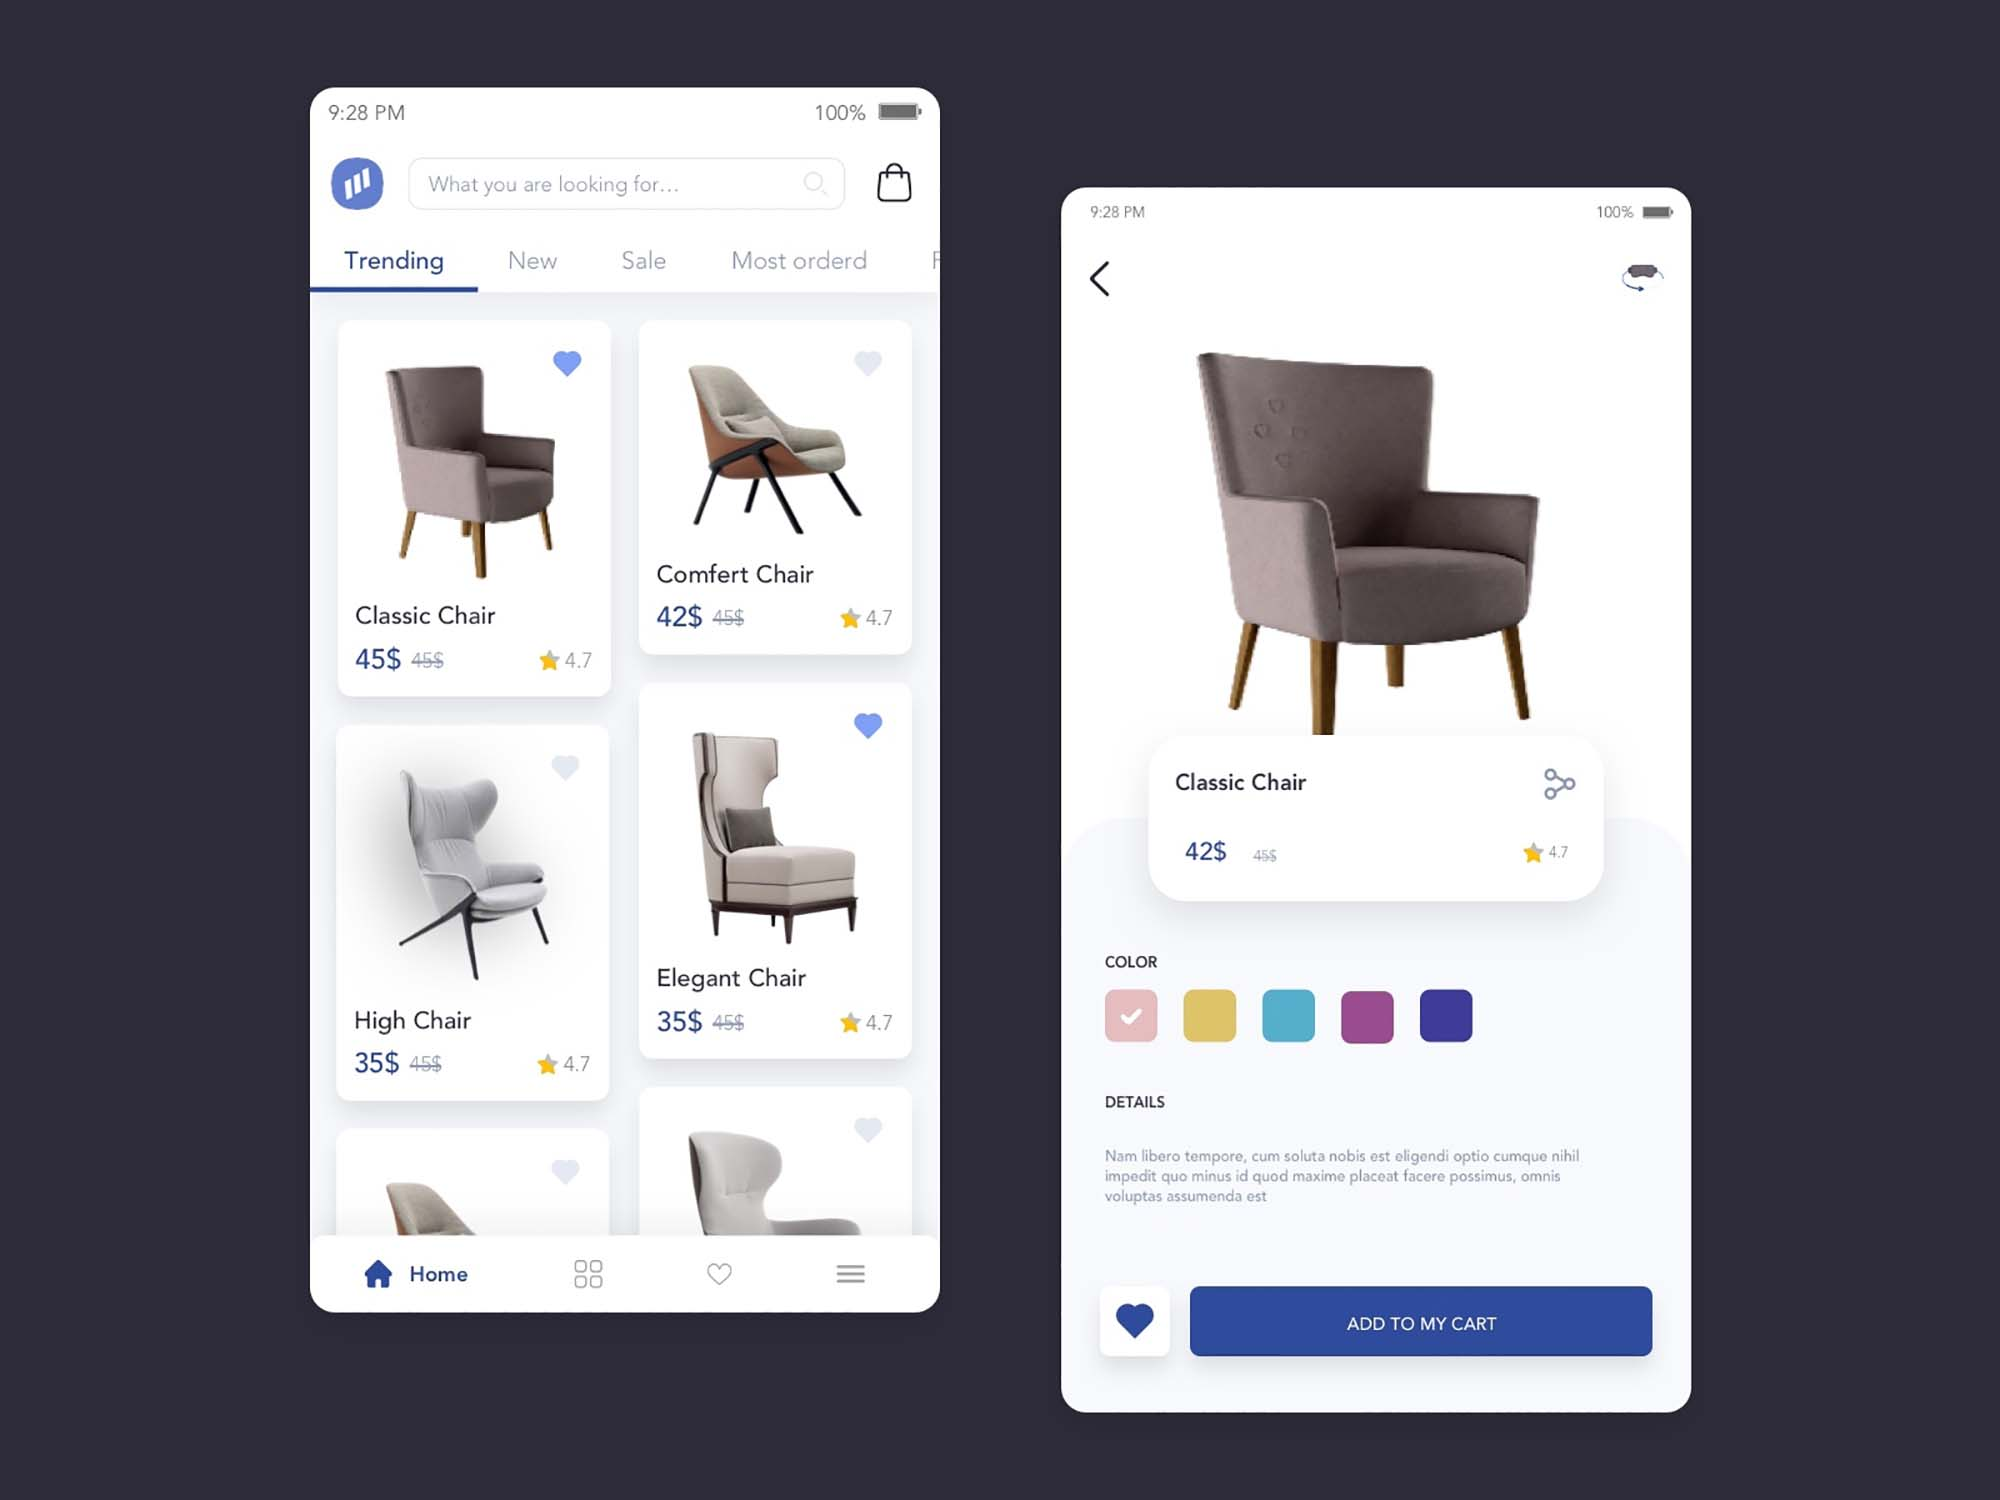 Furniture Store App UI Template 4